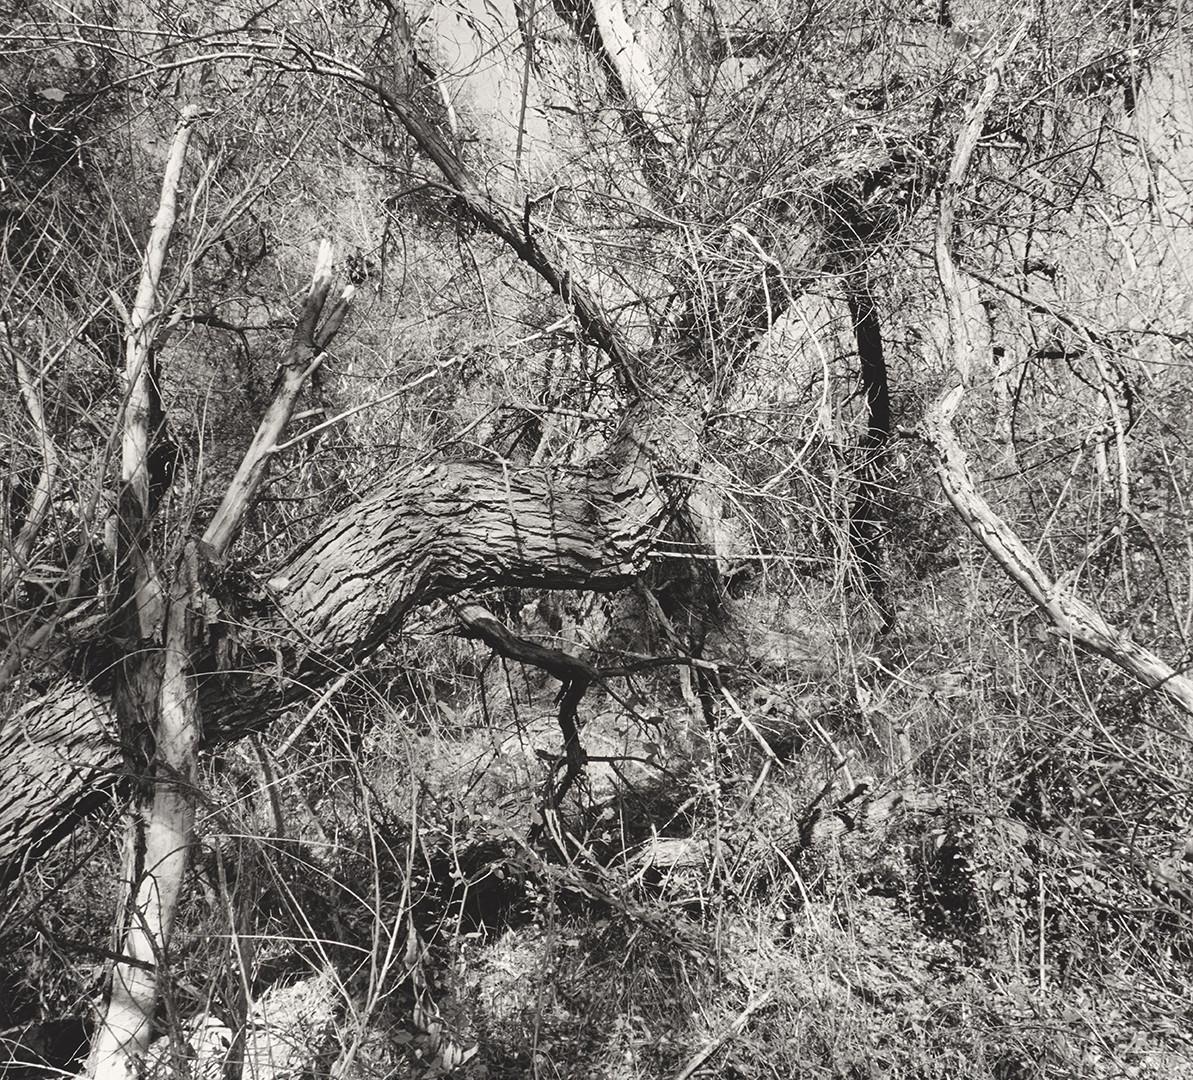 Lee Friedlander, Patagonia, Arizona, 1997